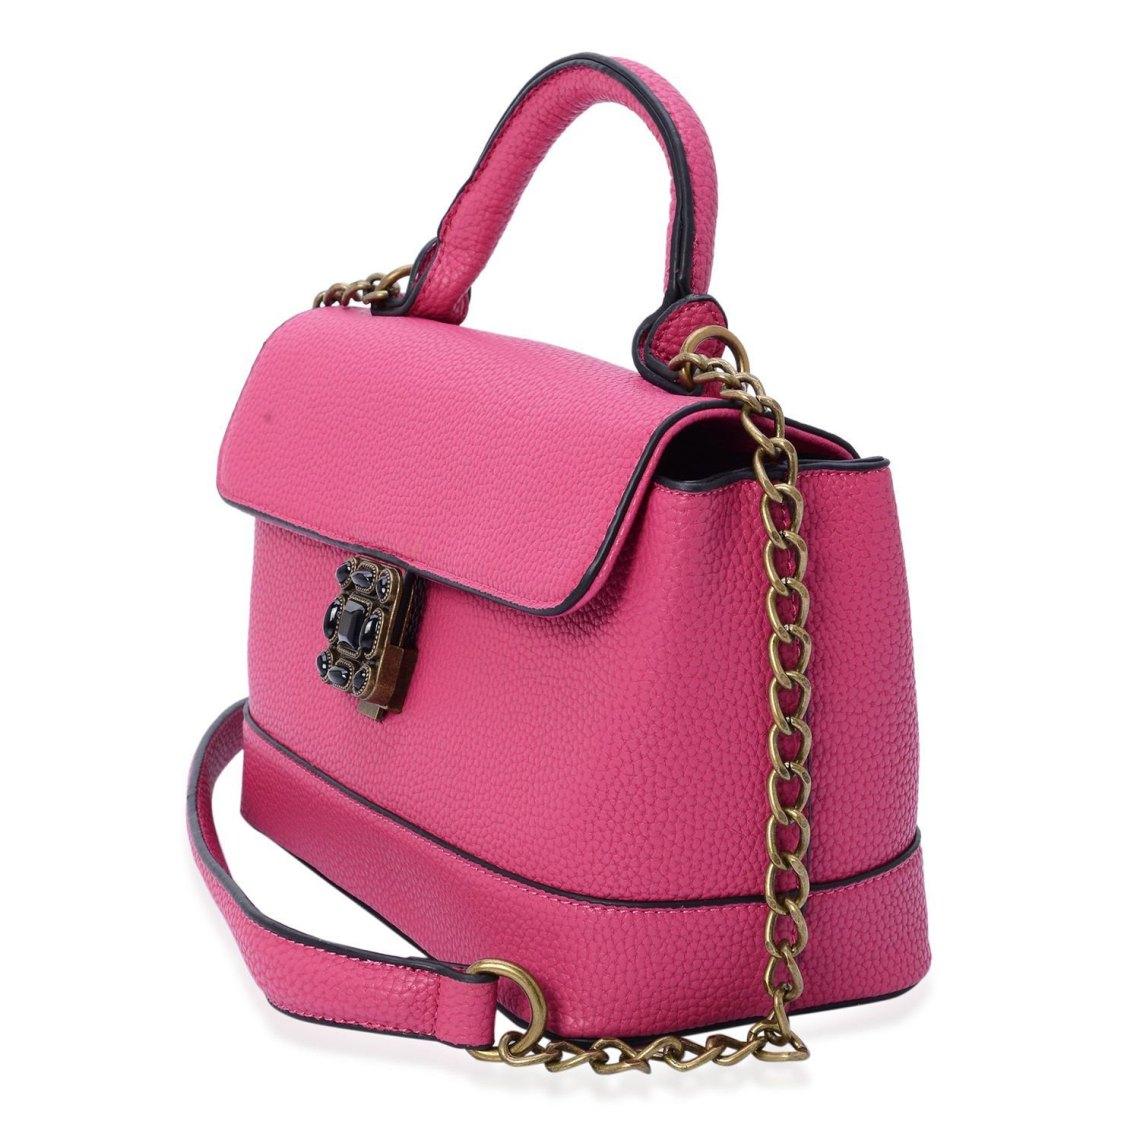 J Francis - Fuchsia Faux Leather Handbag